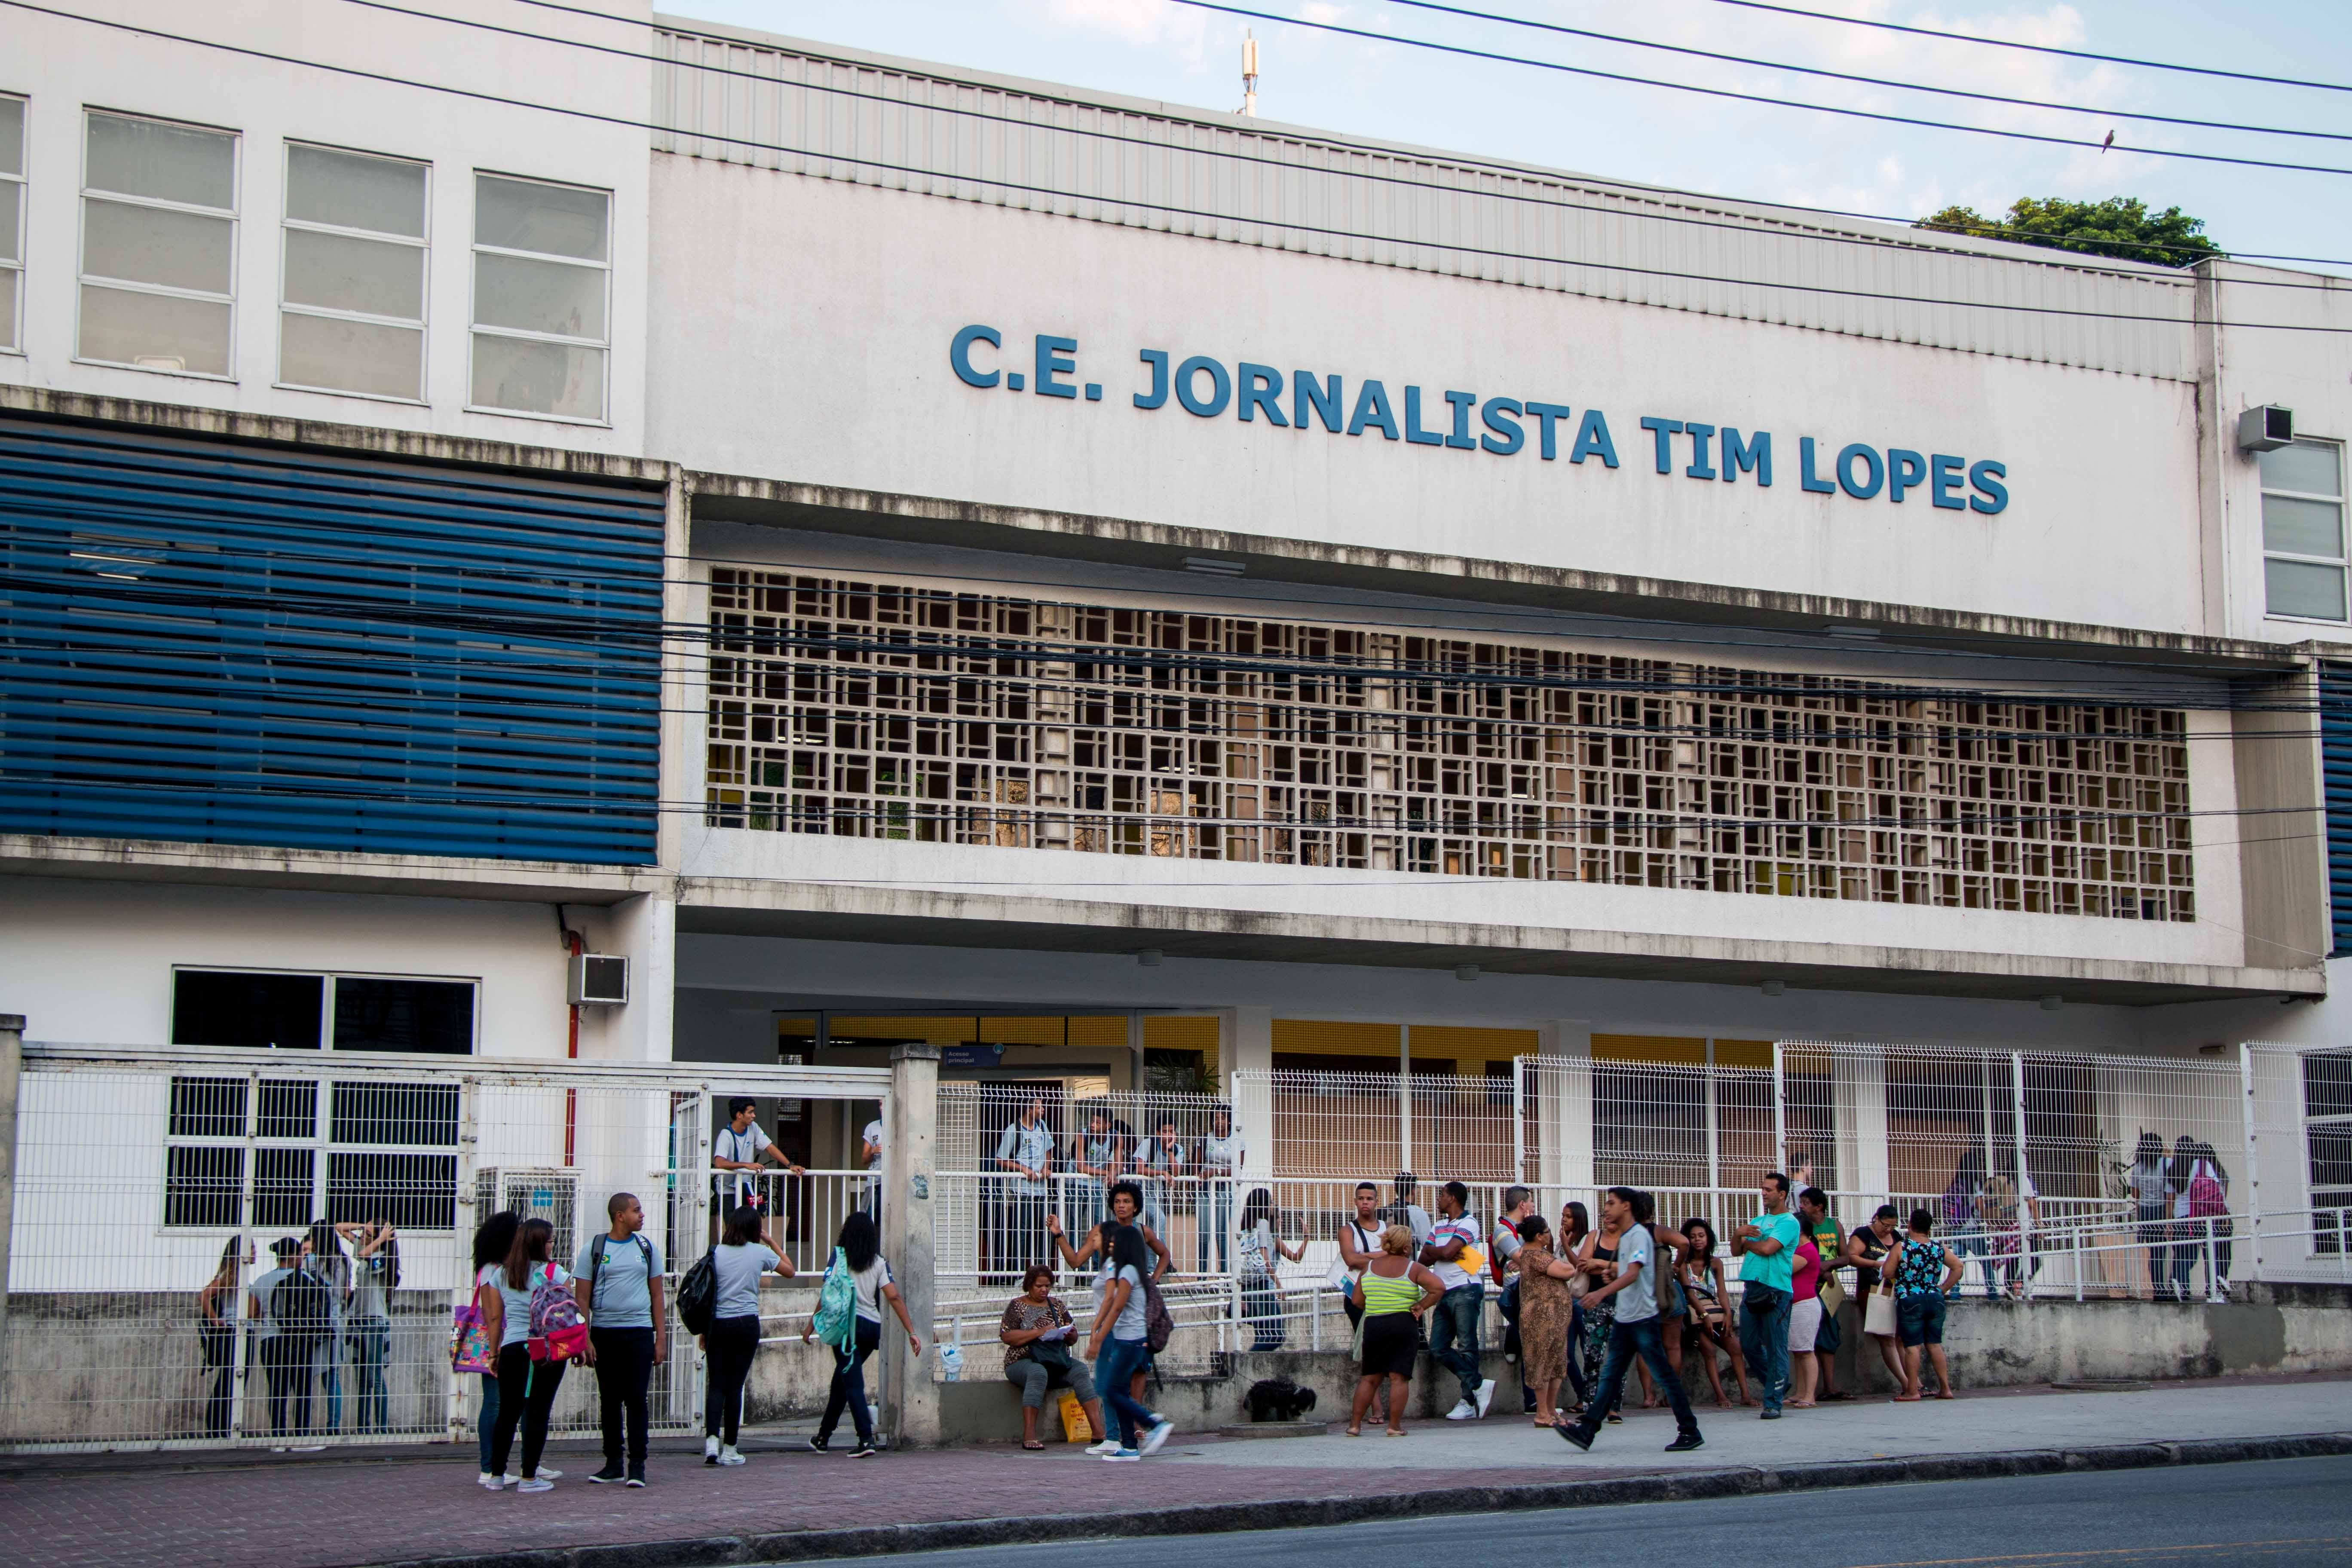 Foto: Renato Moura - Jornal Voz das comunidades